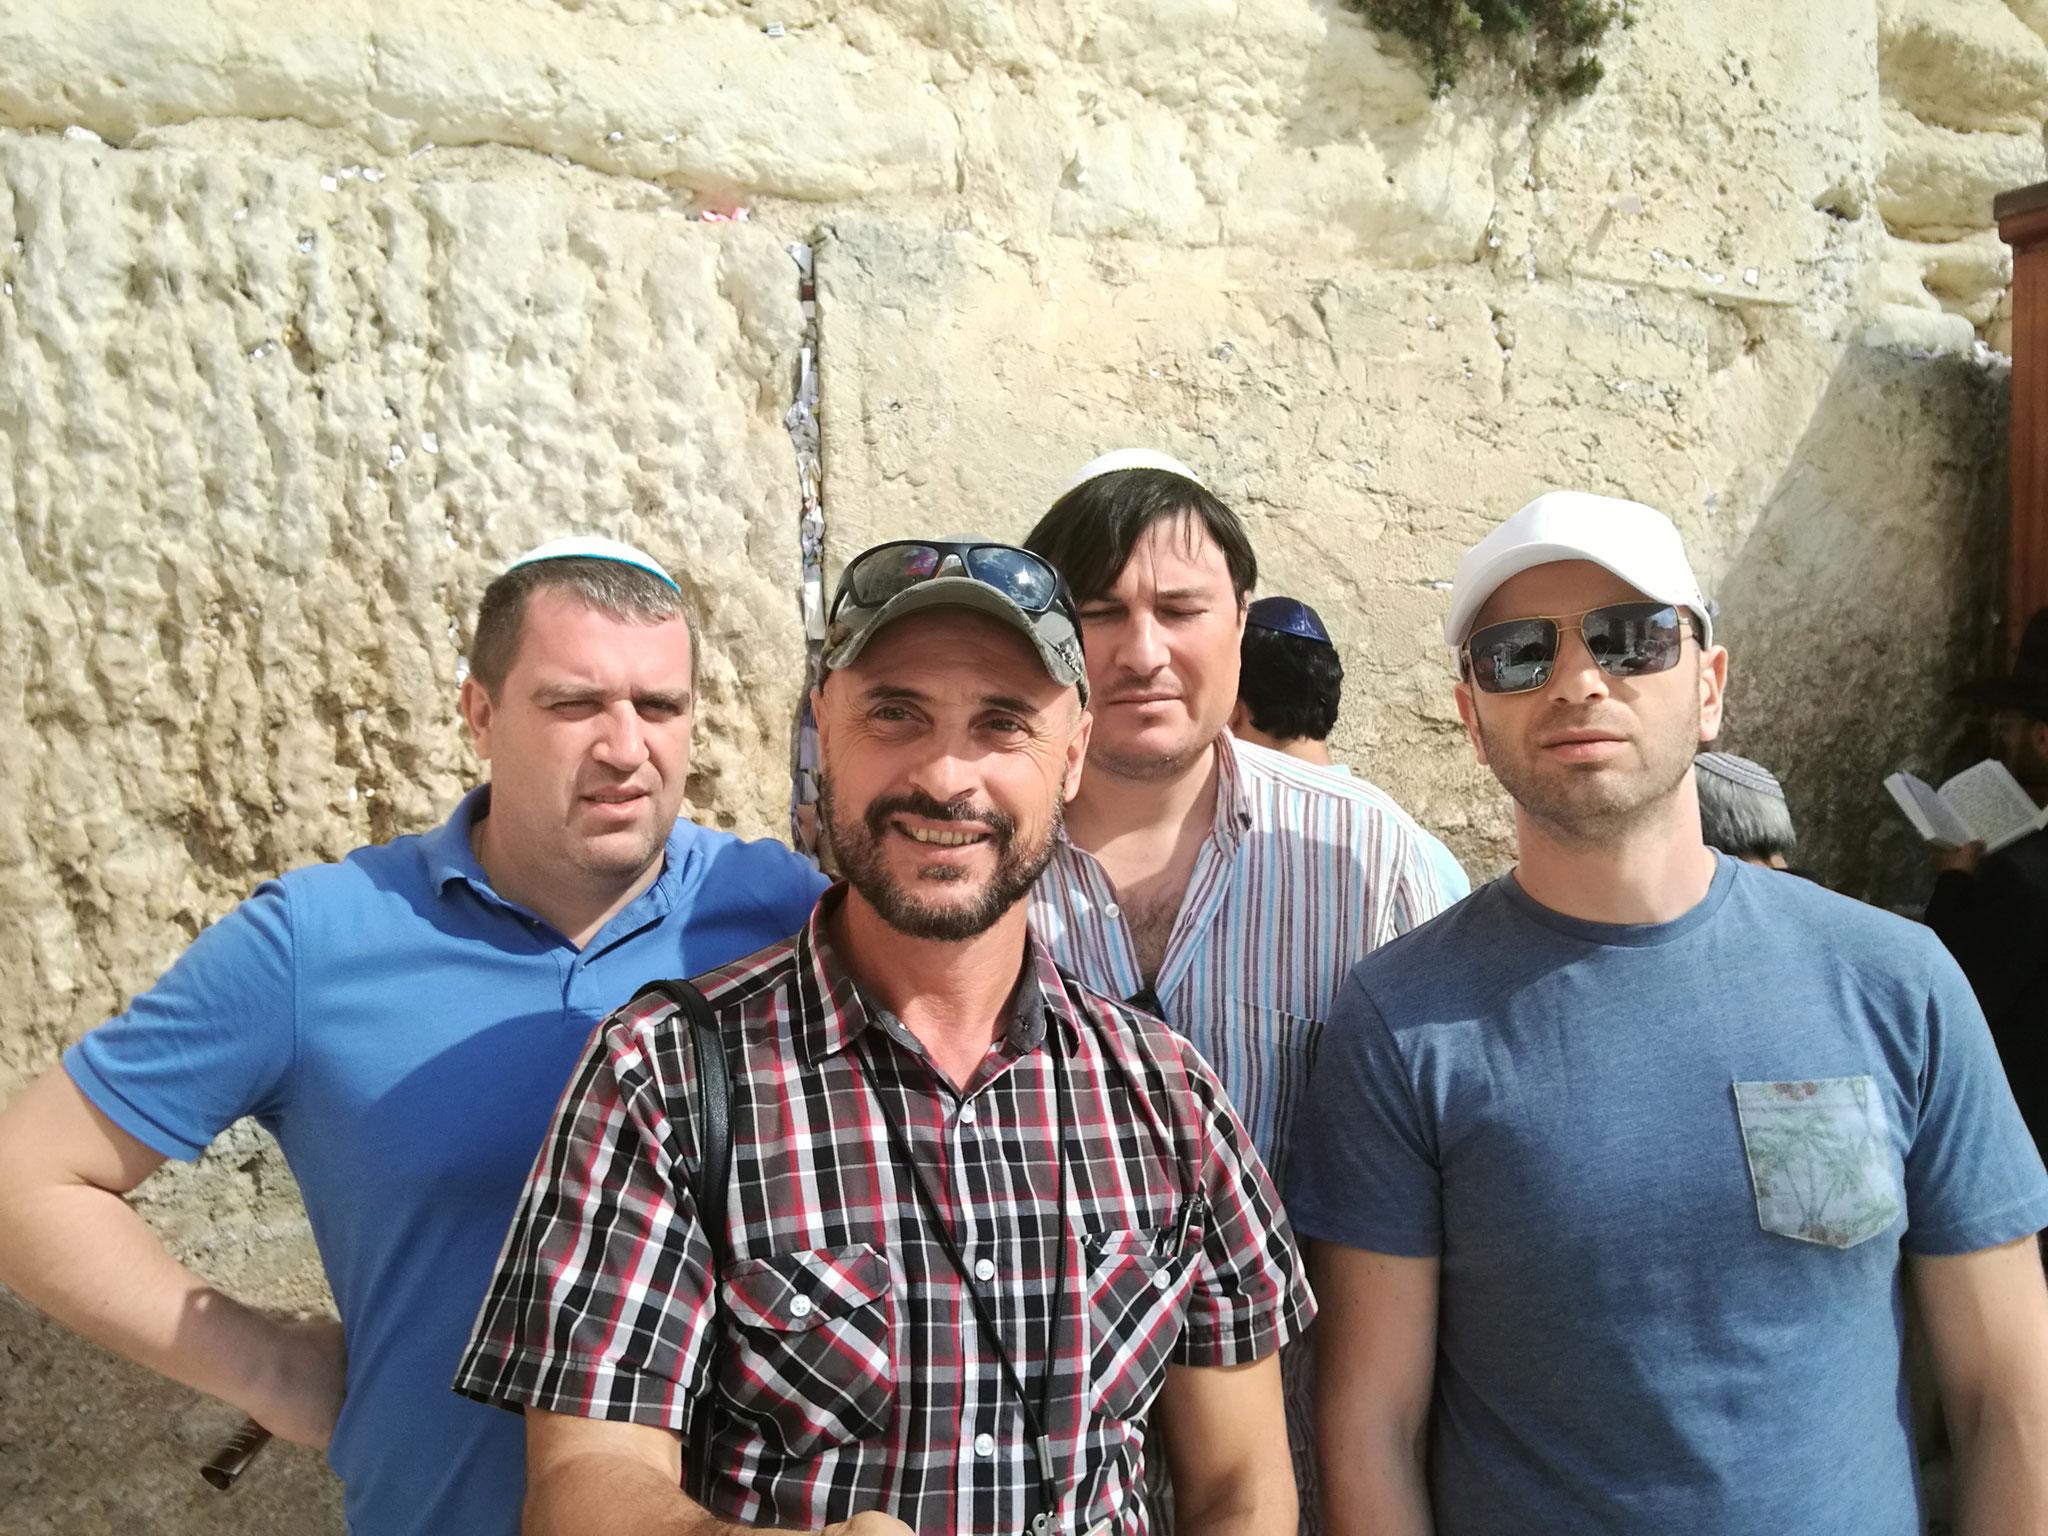 Ukrainian Jewish tourists at the Western Wall, 2017